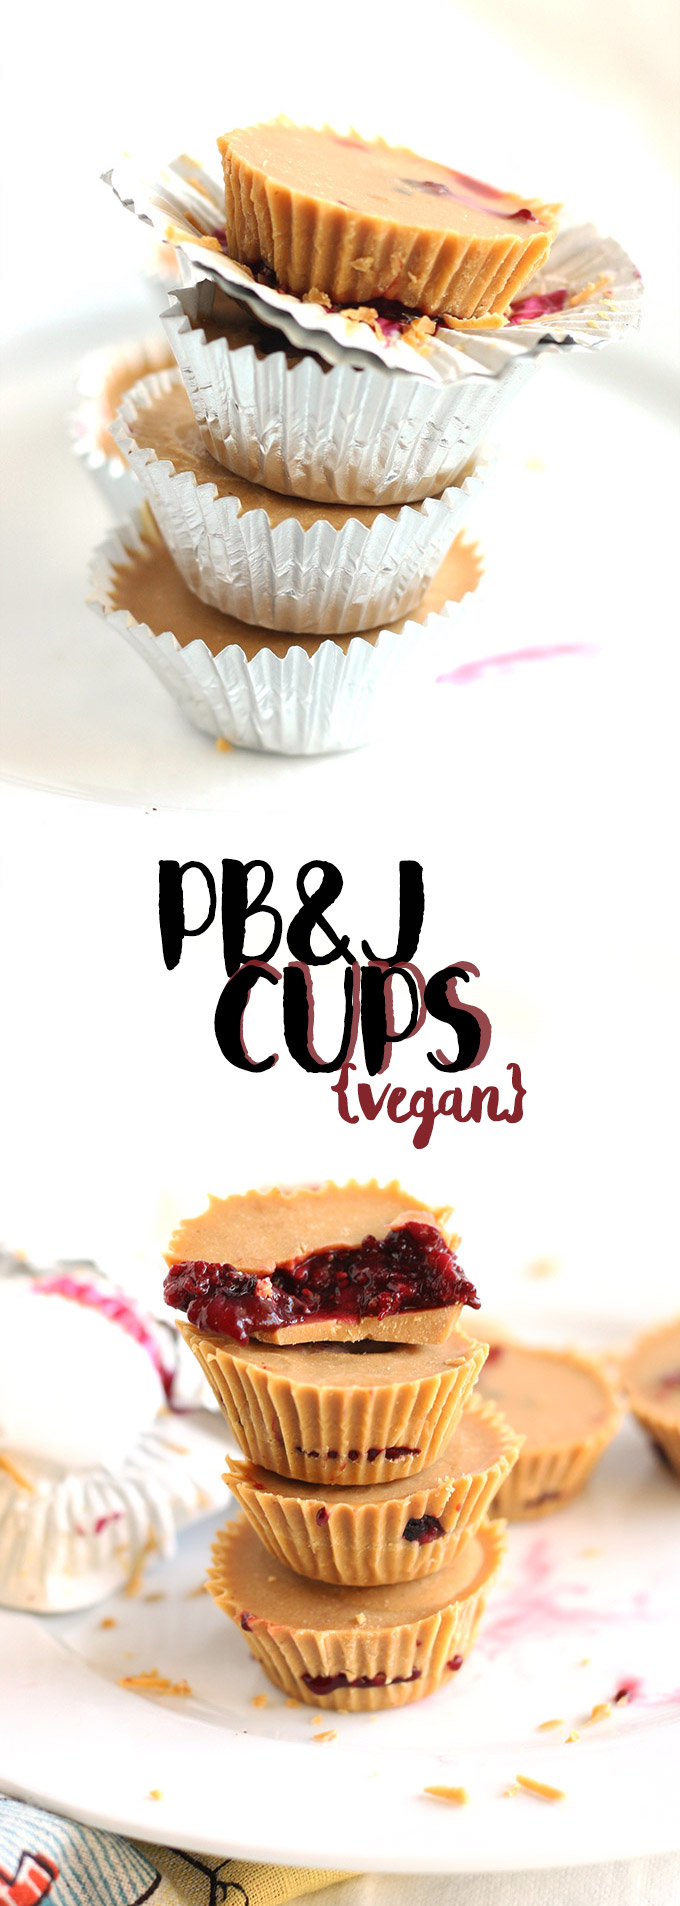 vegan pb&j cups (sugar free!)   love me, feed me